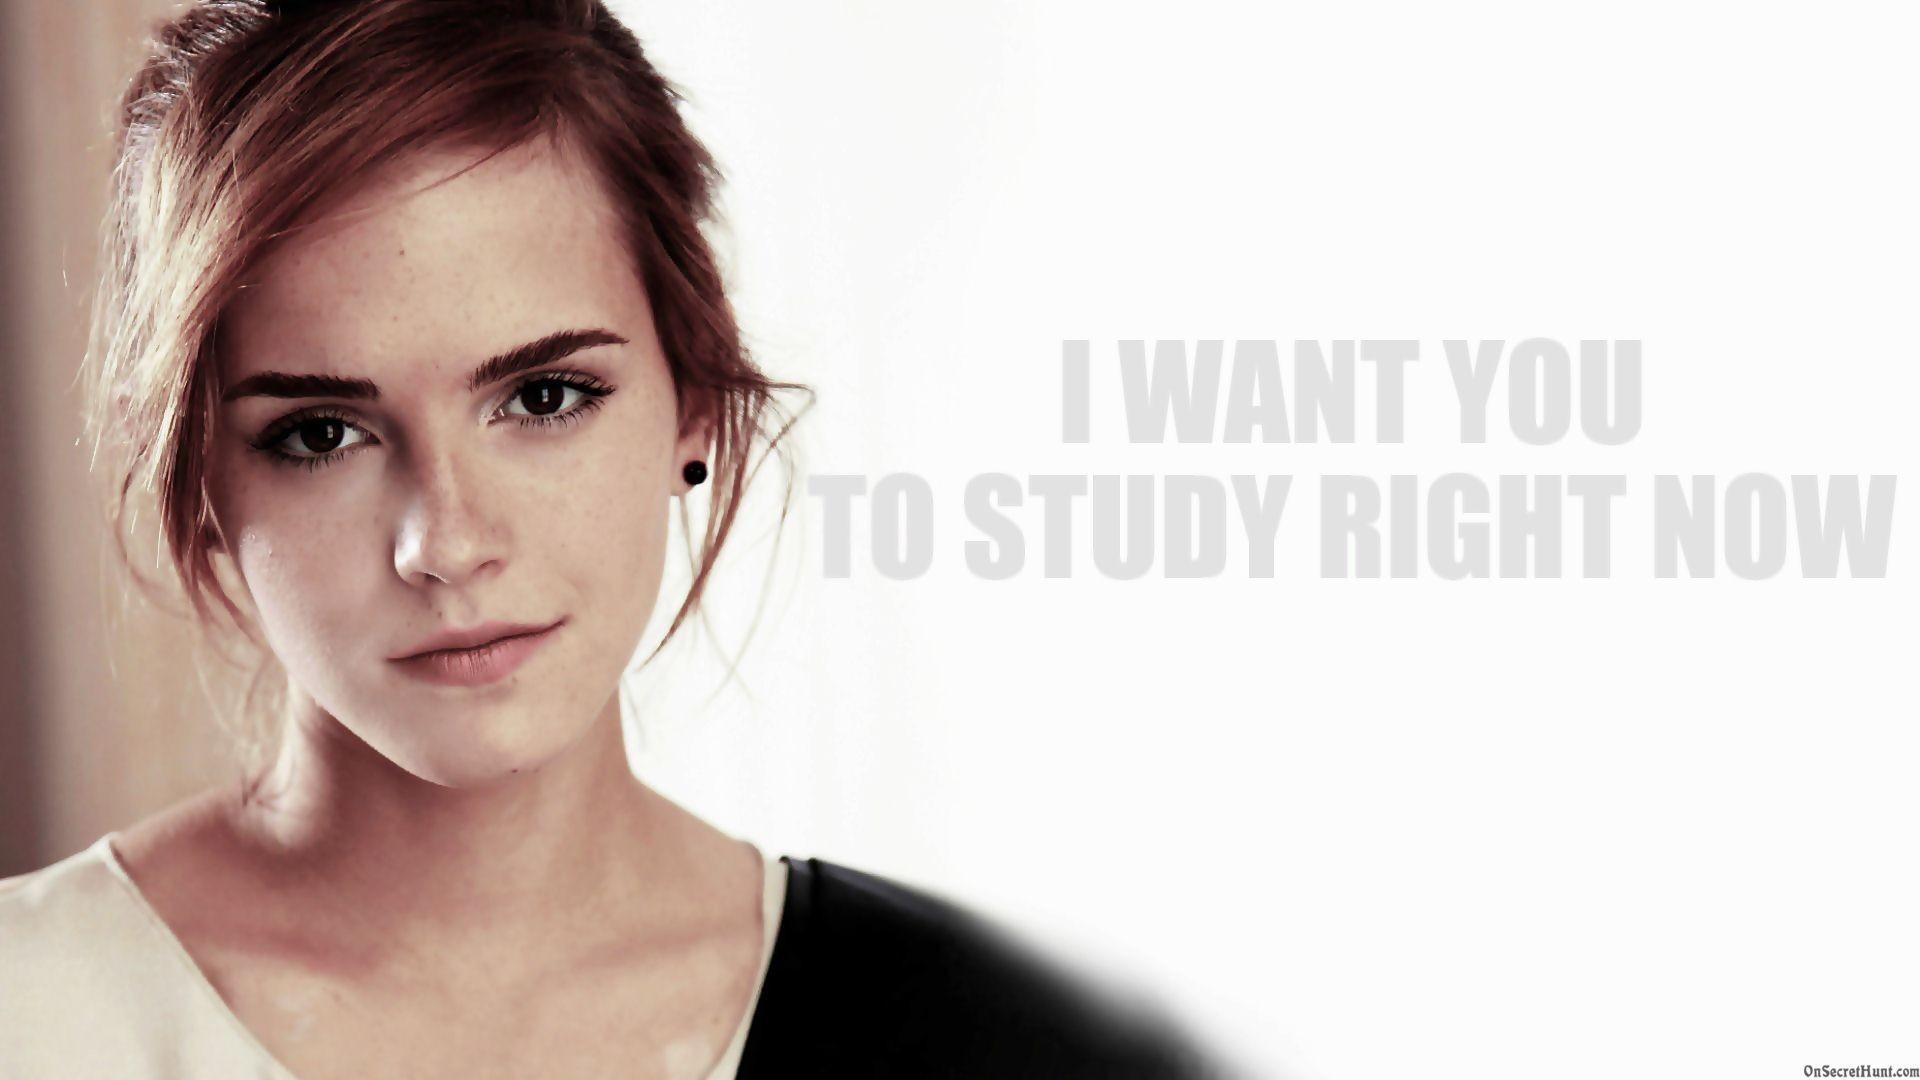 Emma Watson   Emma Watson   Pinterest   Emma watson and Emma watson  wallpaper